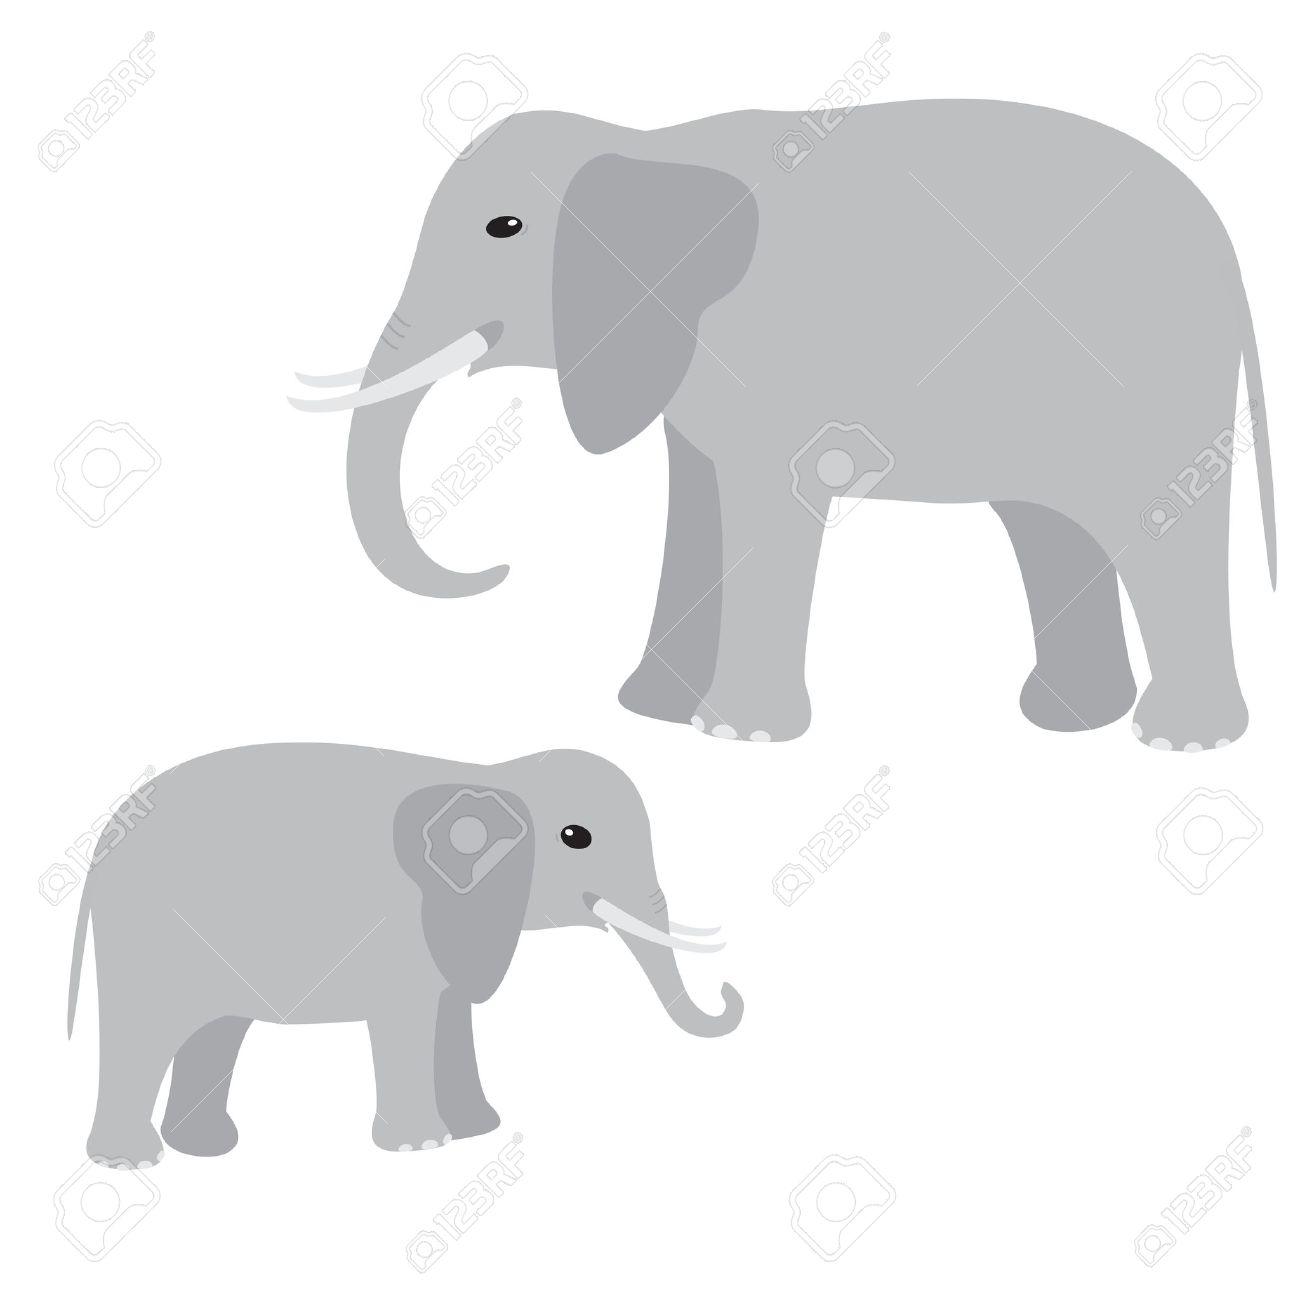 Big and little elephant isolated on white.